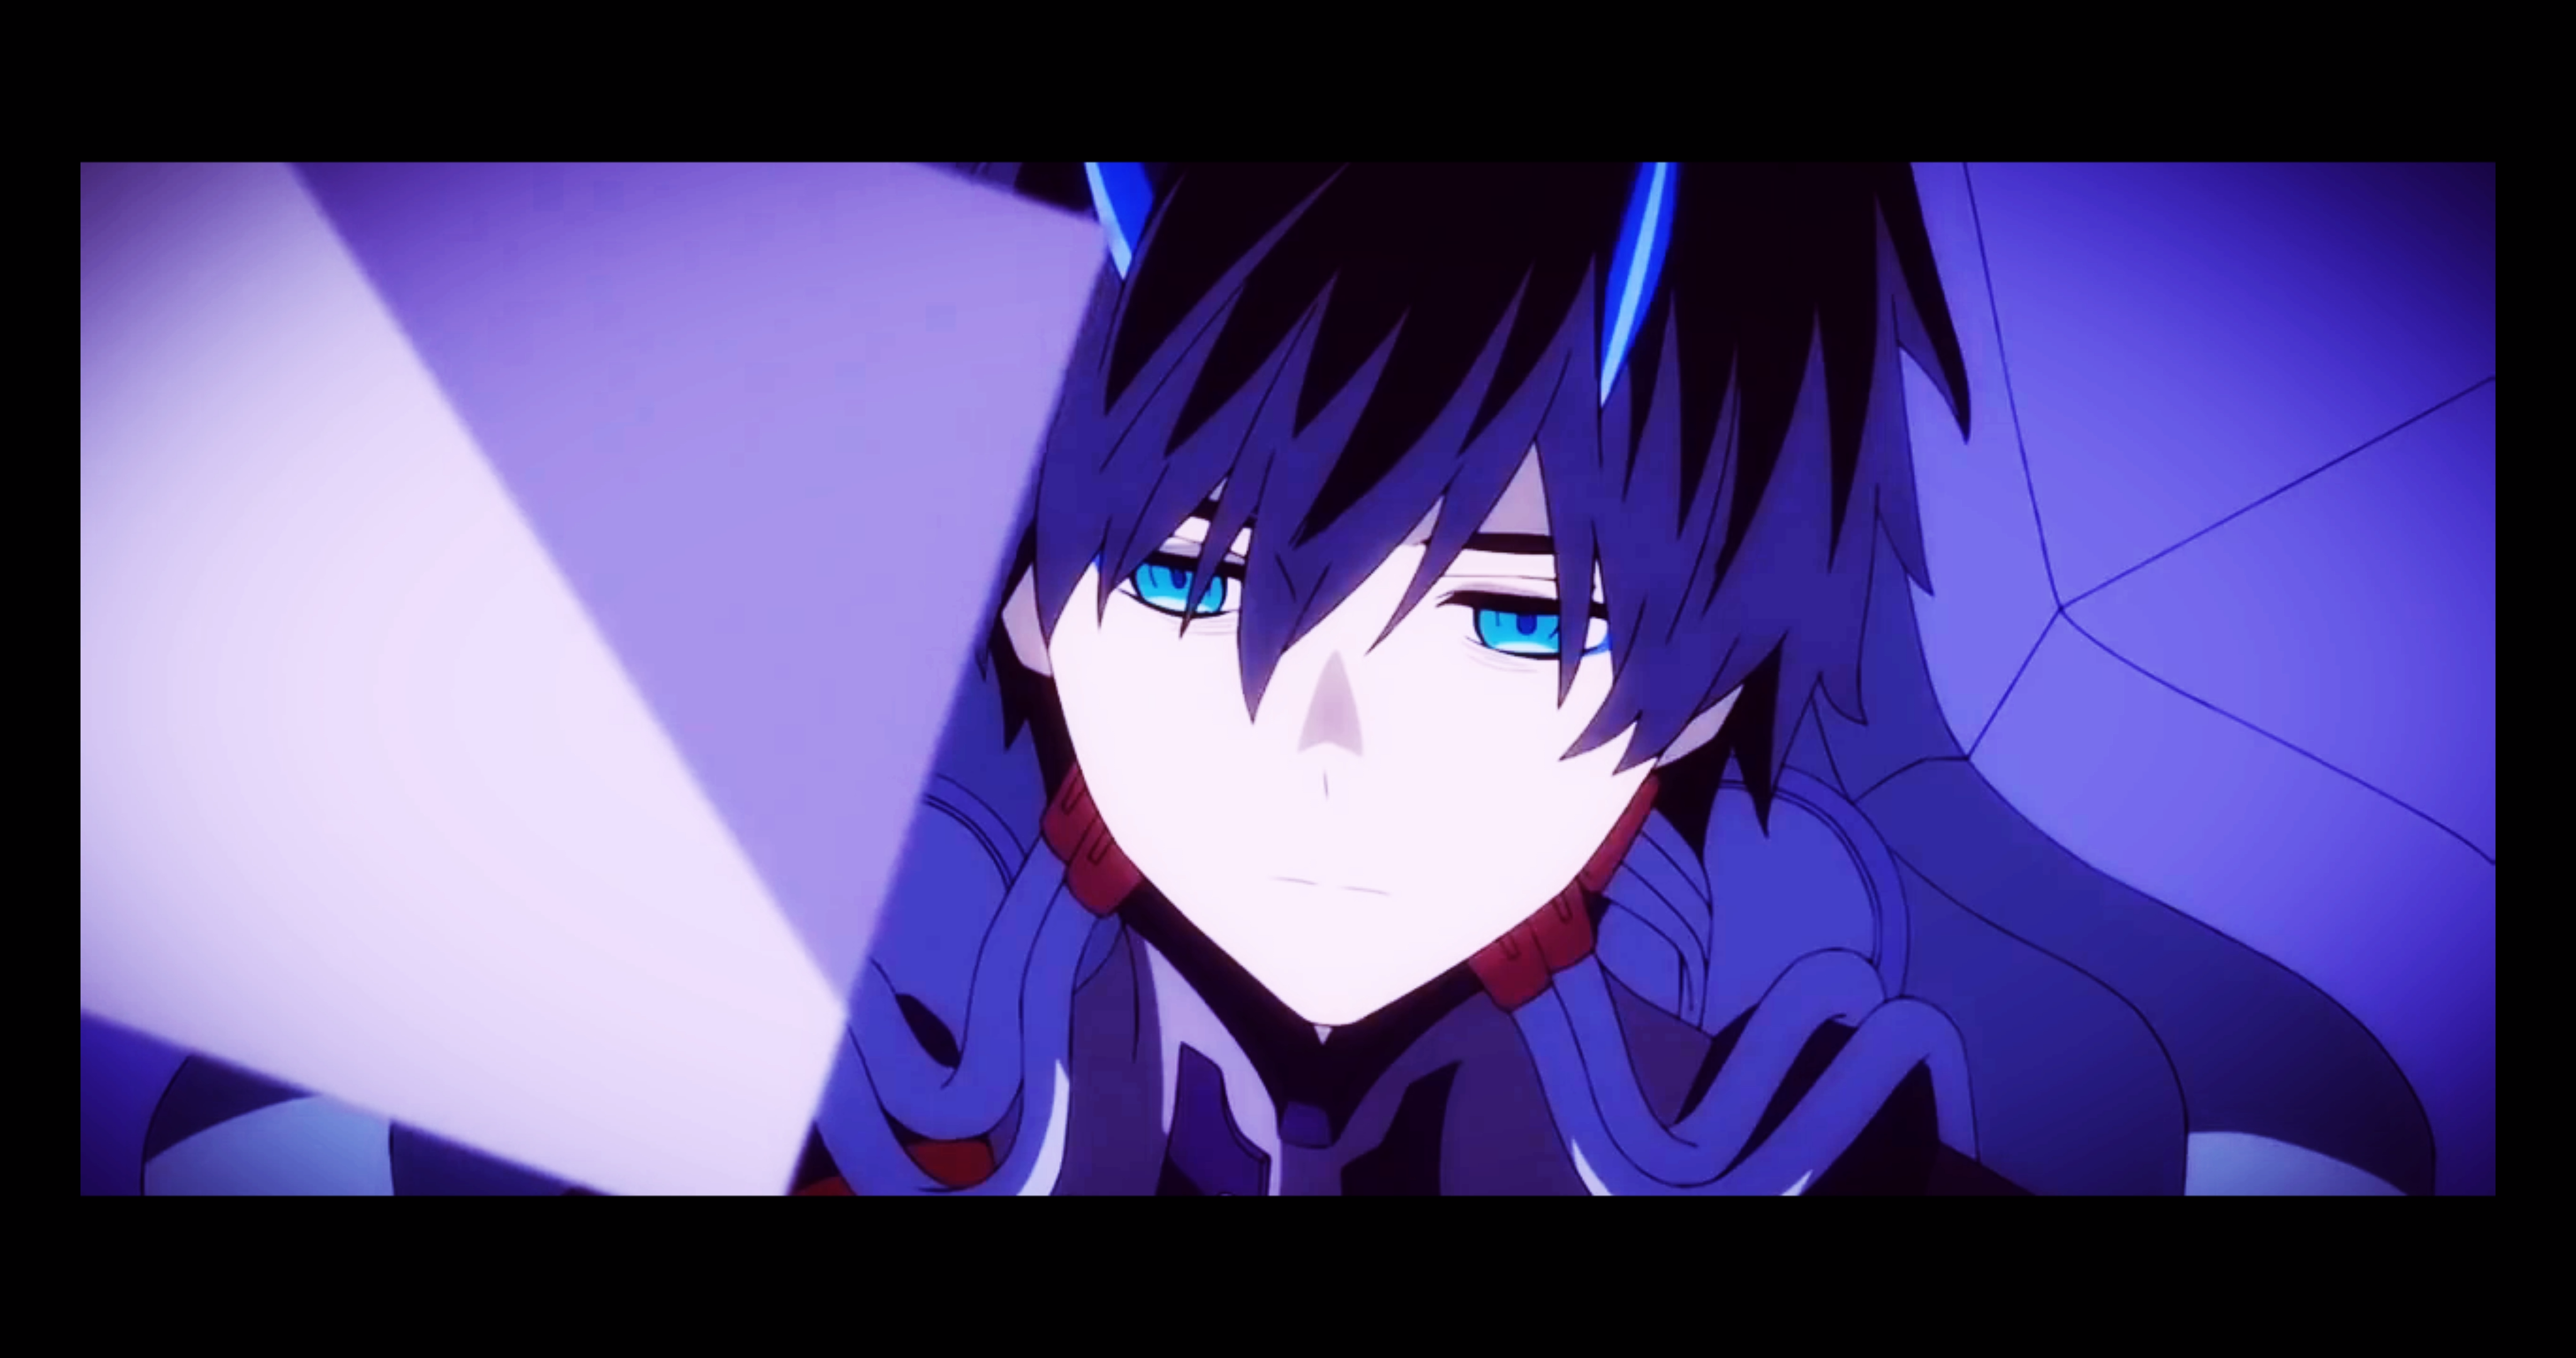 Video Pin Oleh Ammr Di Anime Art Dengan Video Gambar Manga Karakter Animasi Animasi